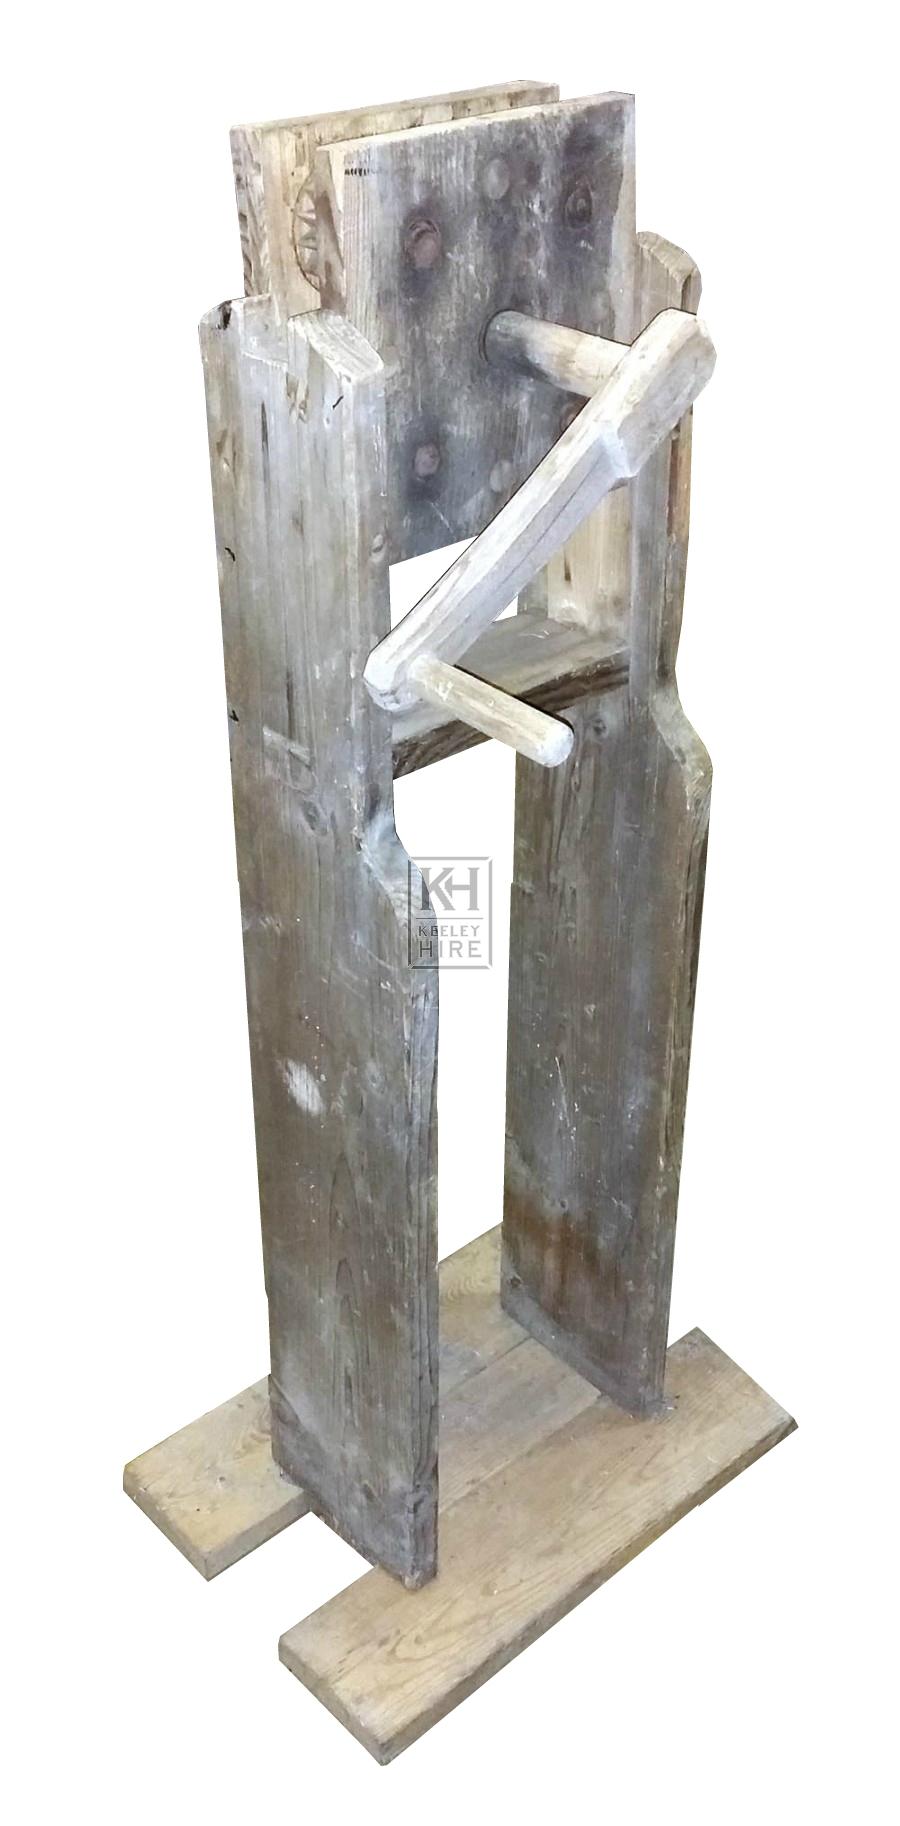 Large freestanding crank device